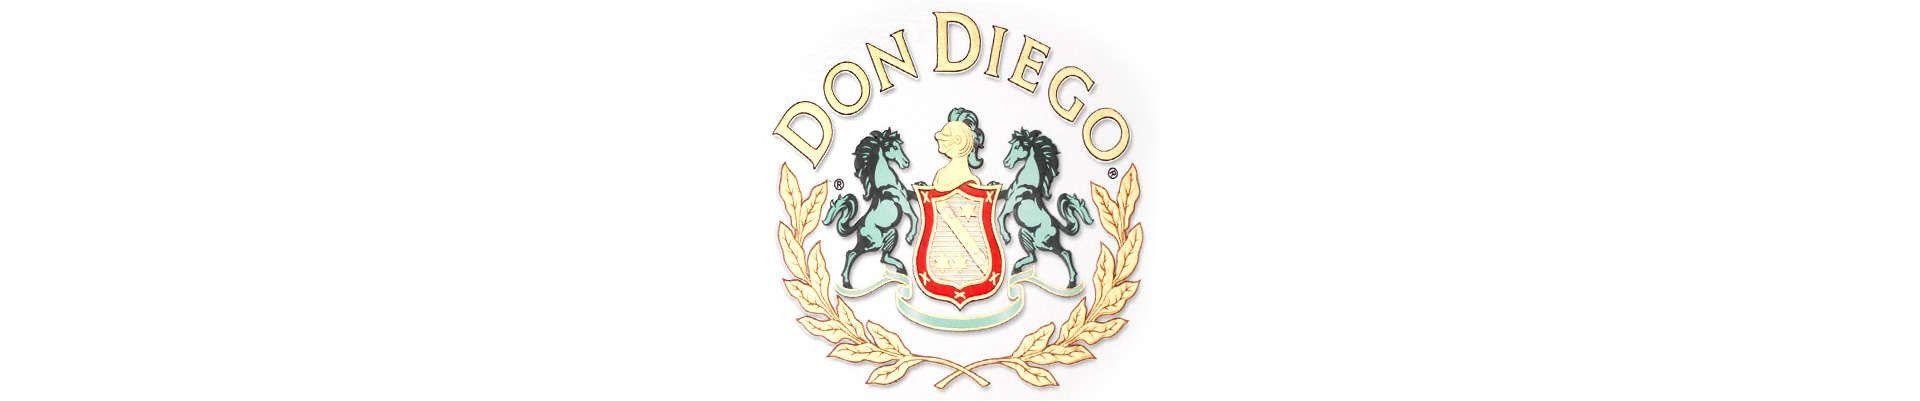 Trabucuri Don Diego trabucuri dominicane Don Diego trabuc Don Diego.